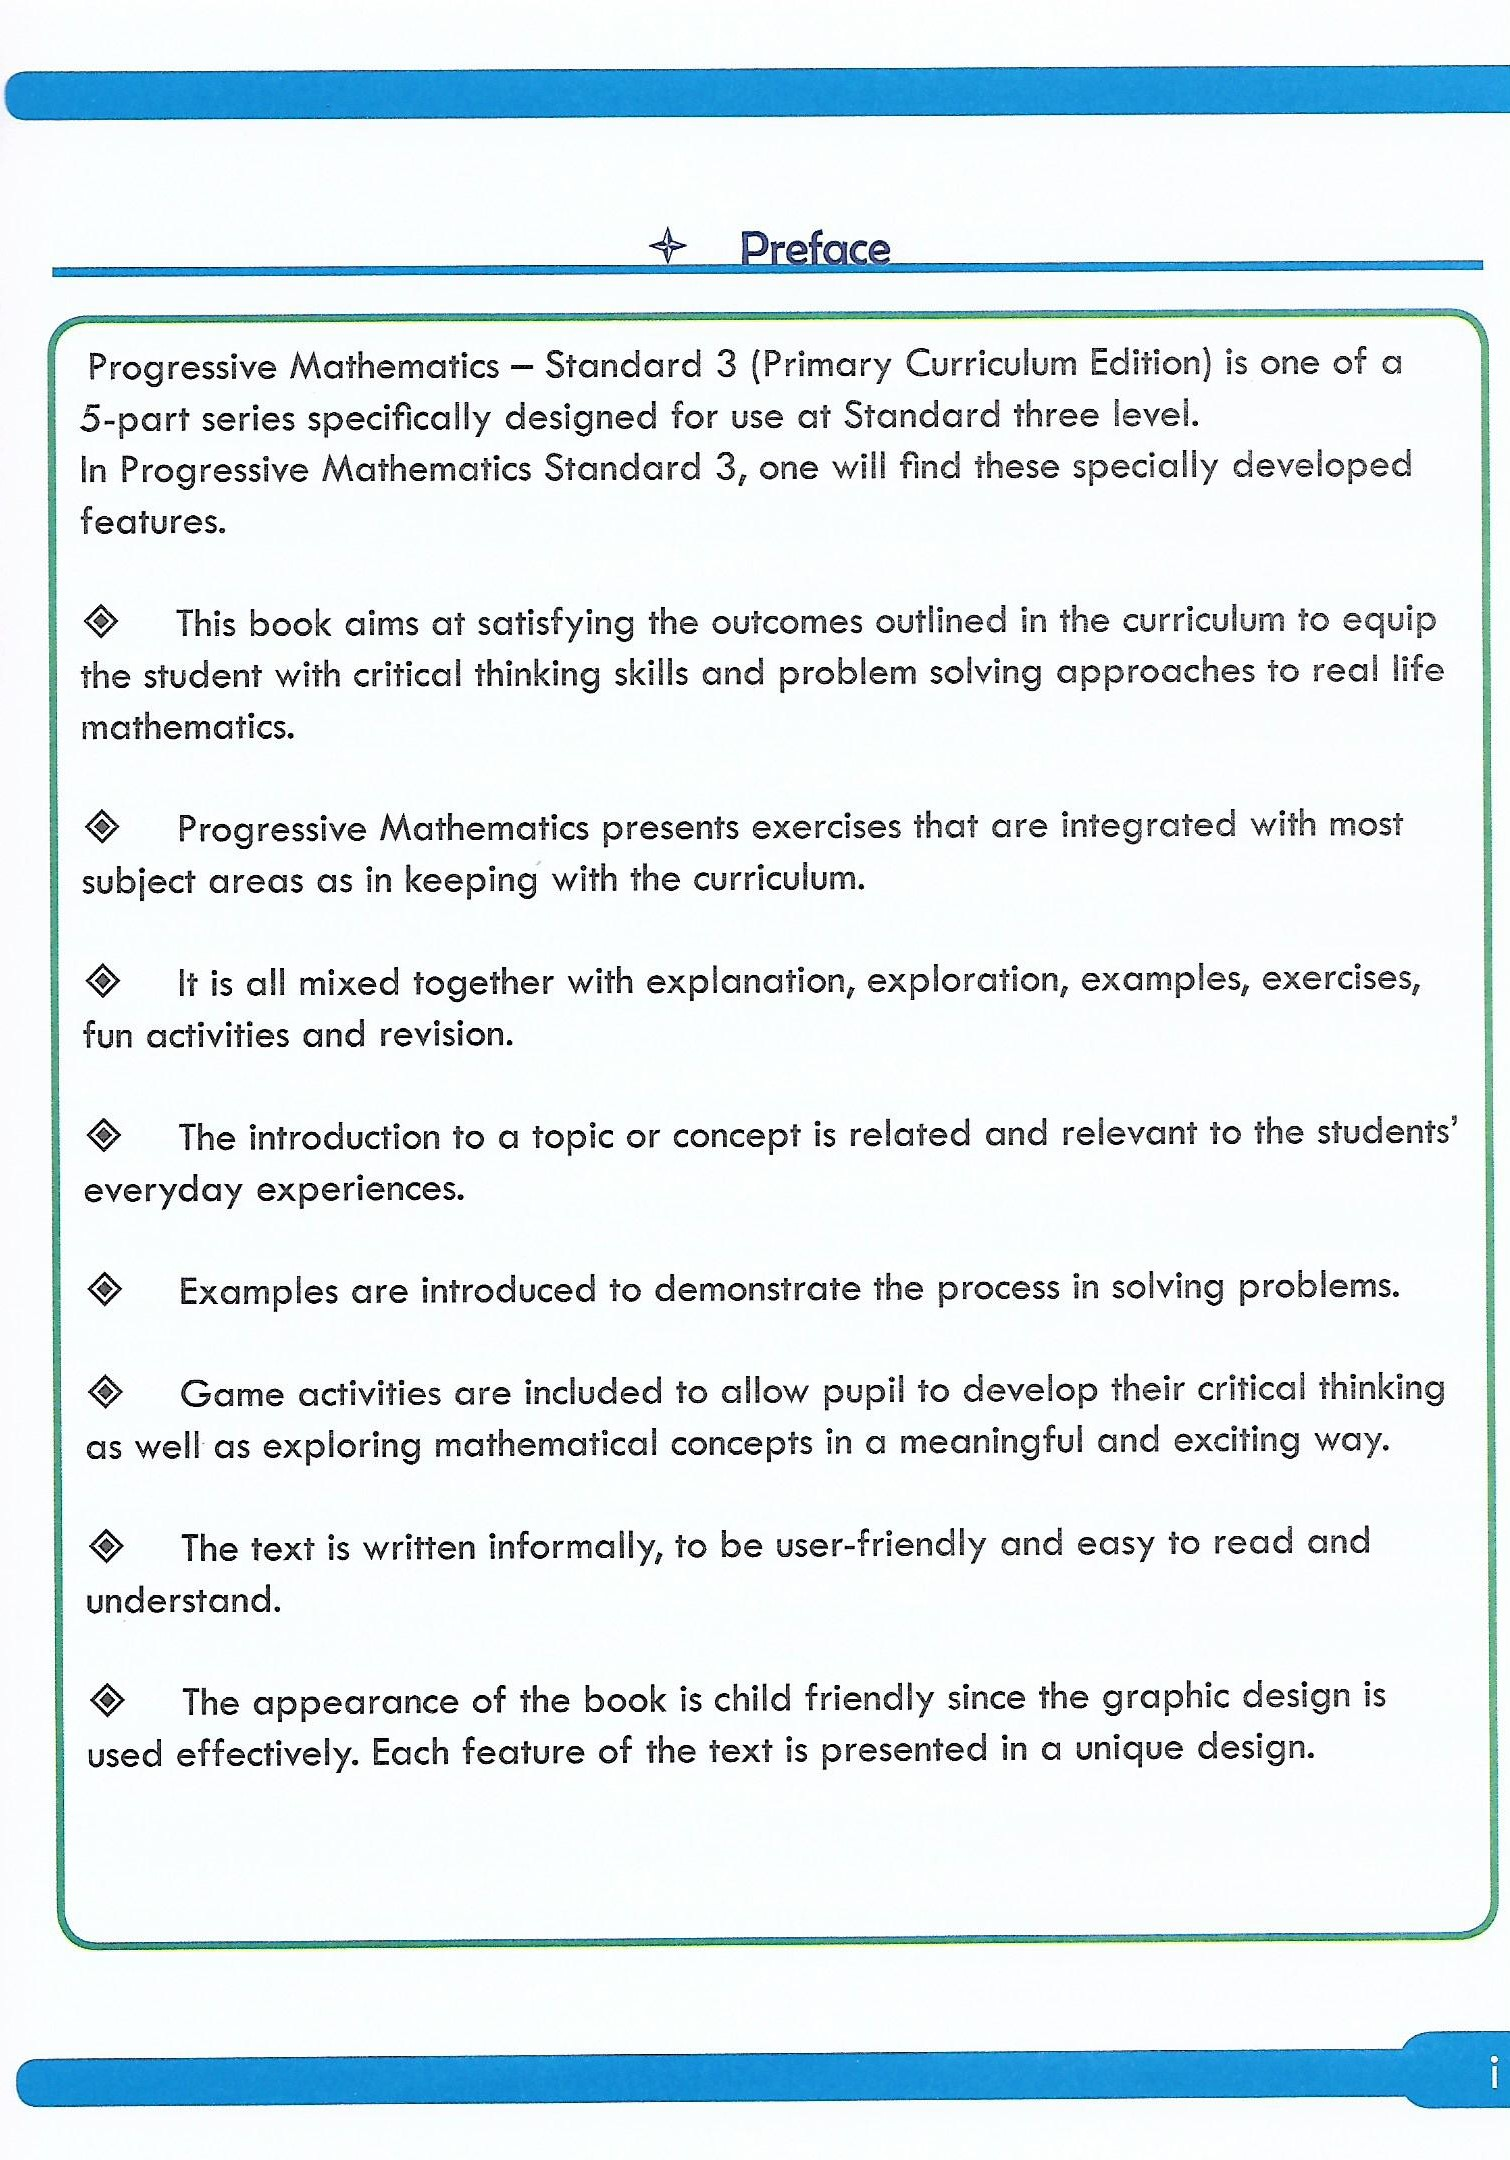 Progressive Mathematics For Primary Schools Book 3